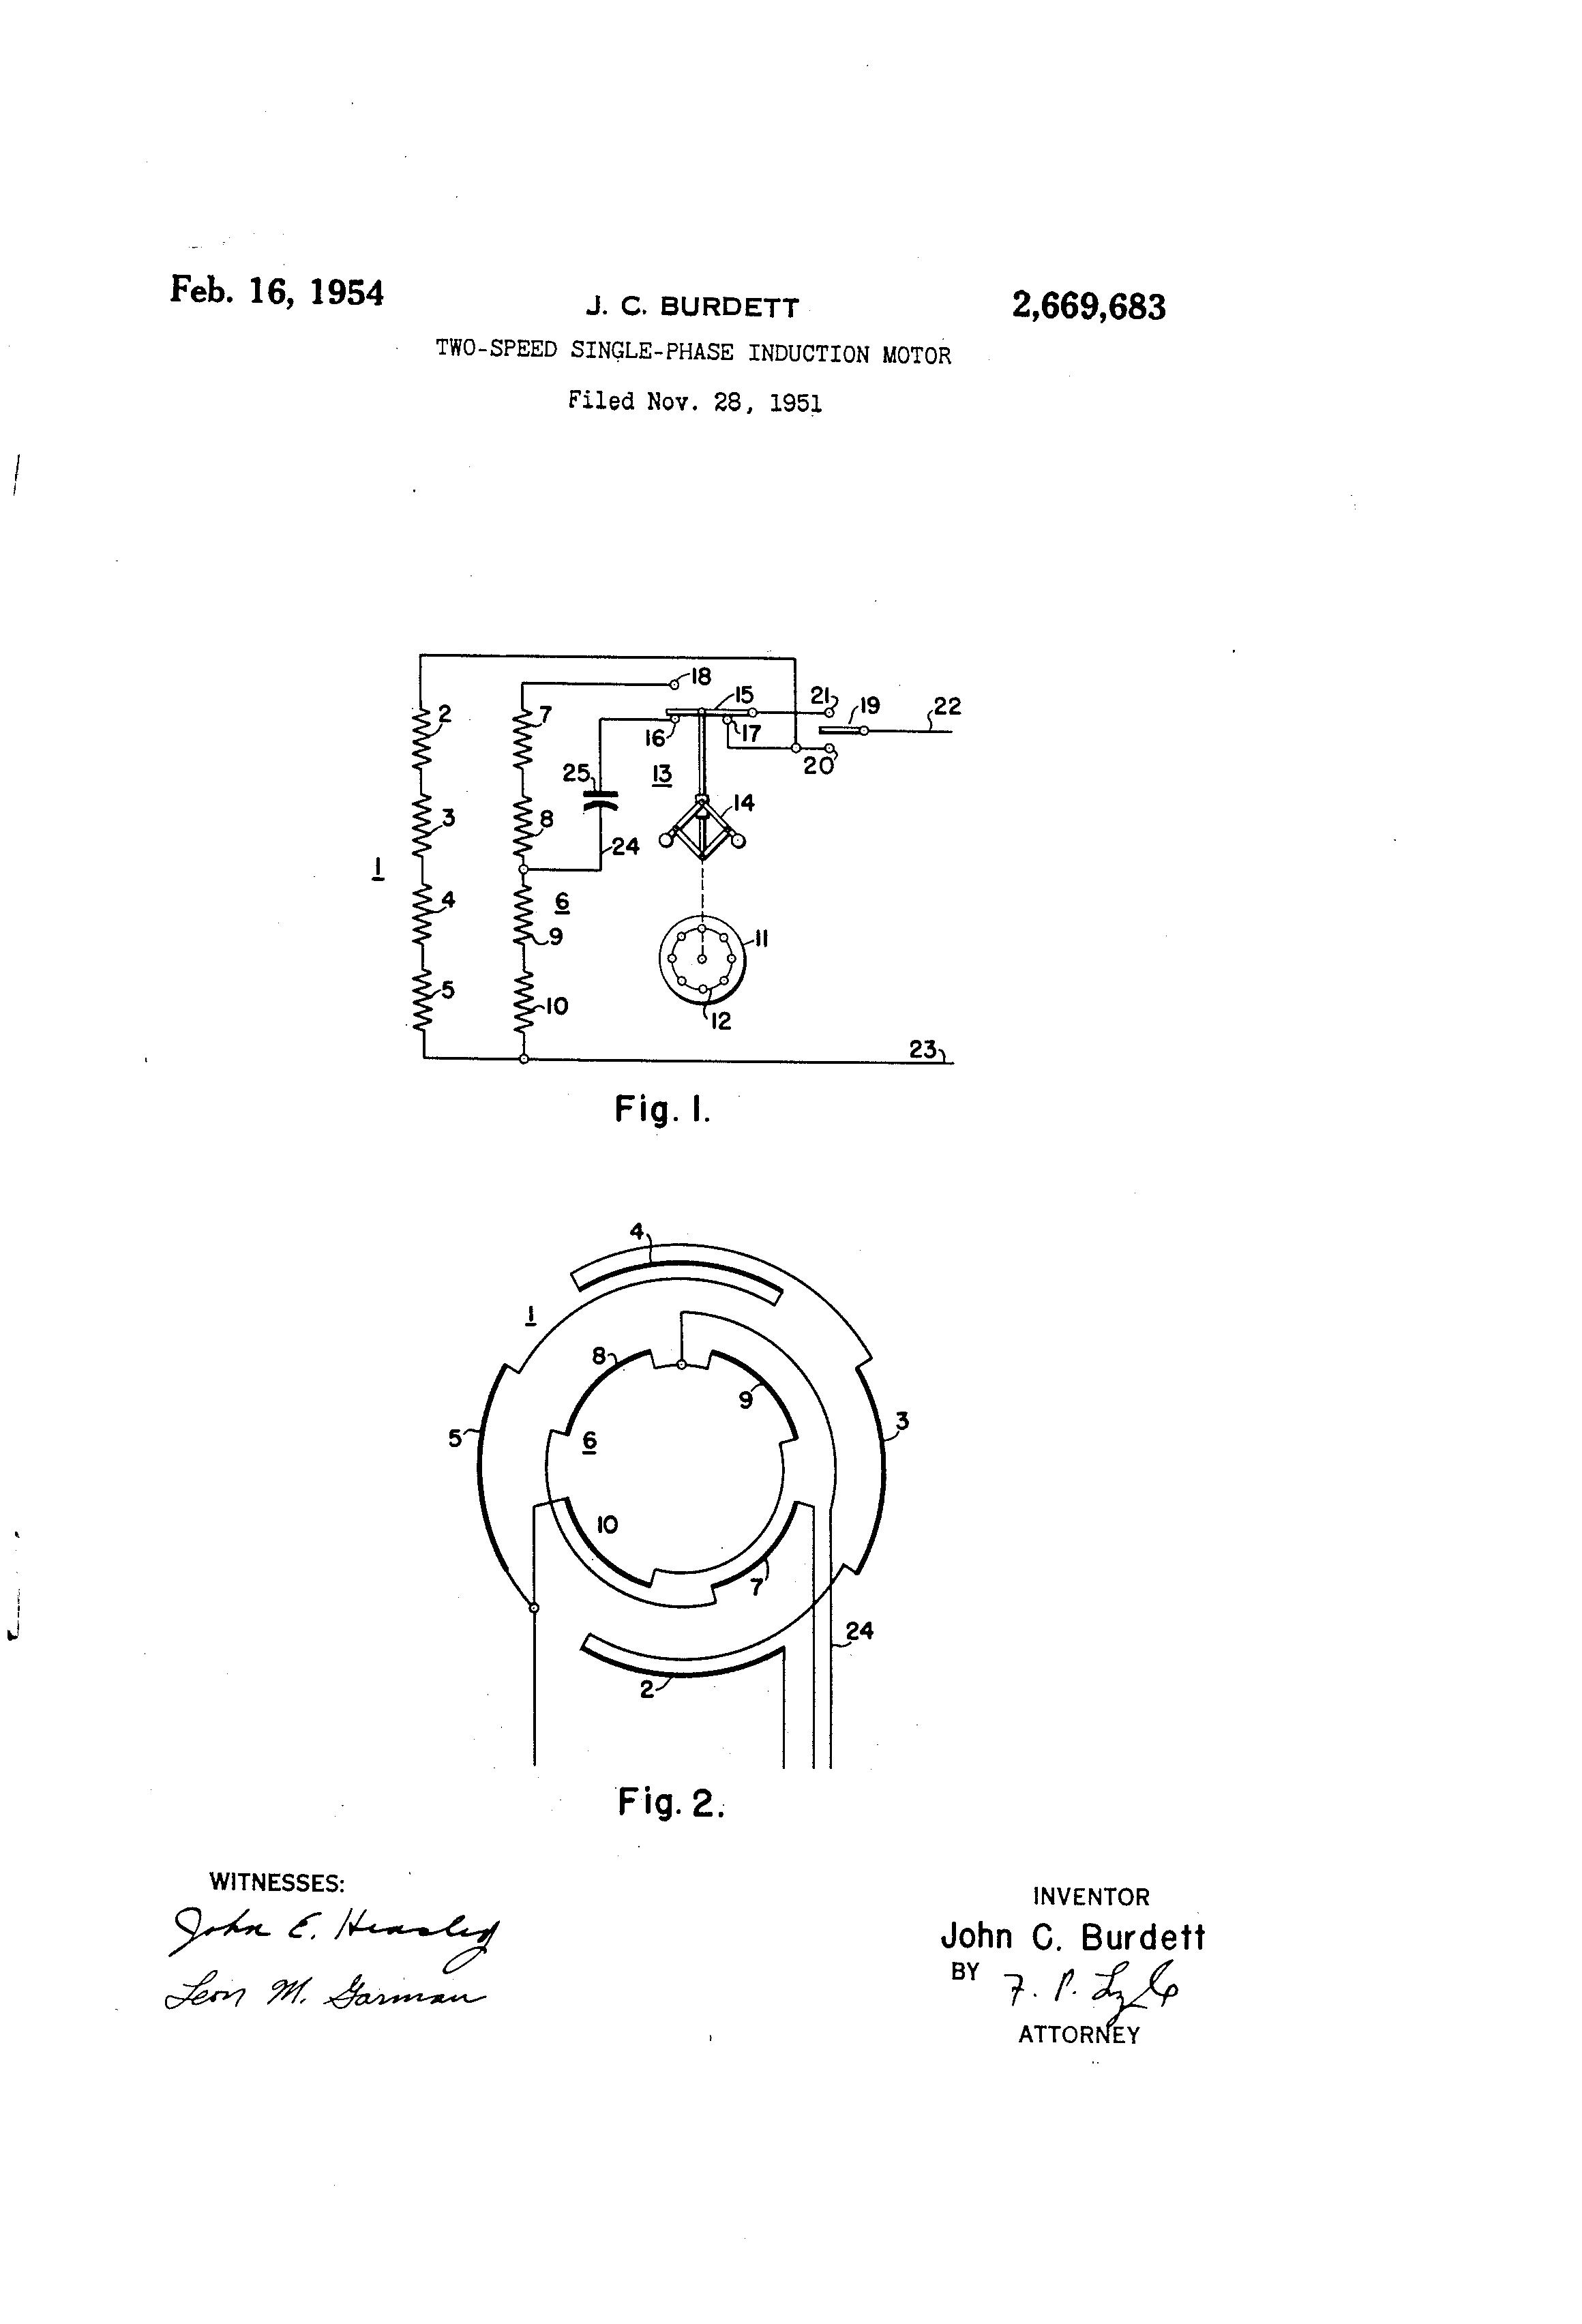 westinghouse ac motor wiring diagram westinghouse westinghouse ac motor wiring diagram diagrams on westinghouse ac motor wiring diagram